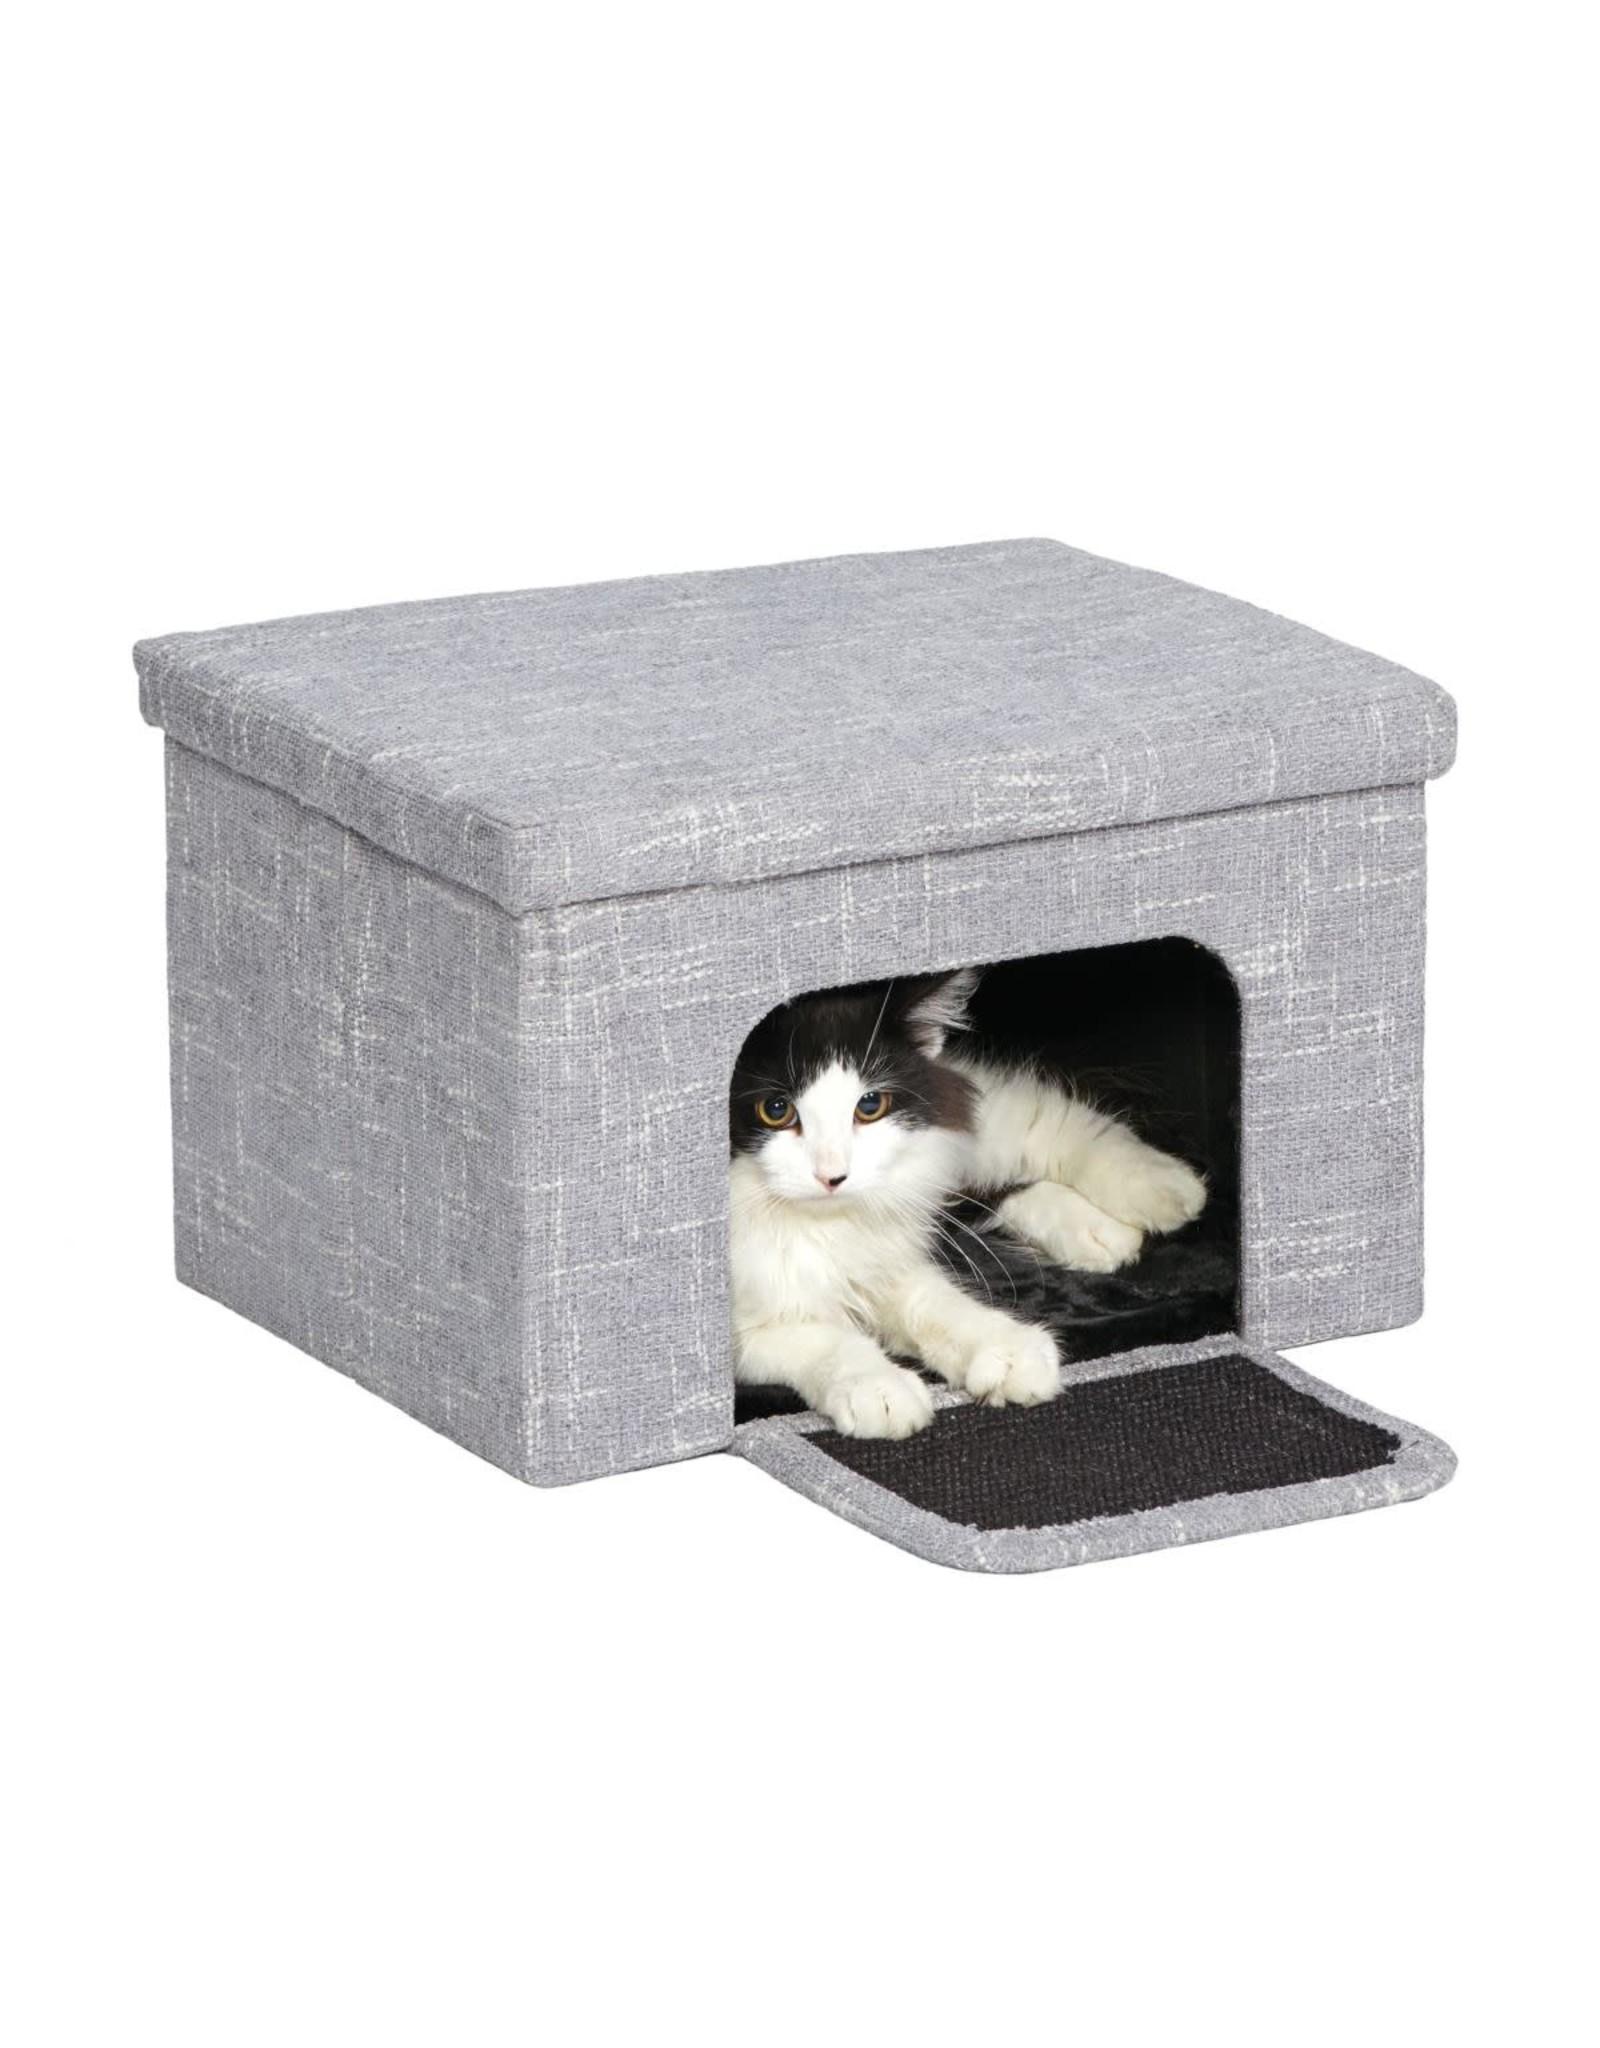 Midwest Midwest Curious Cat Cube Cottage